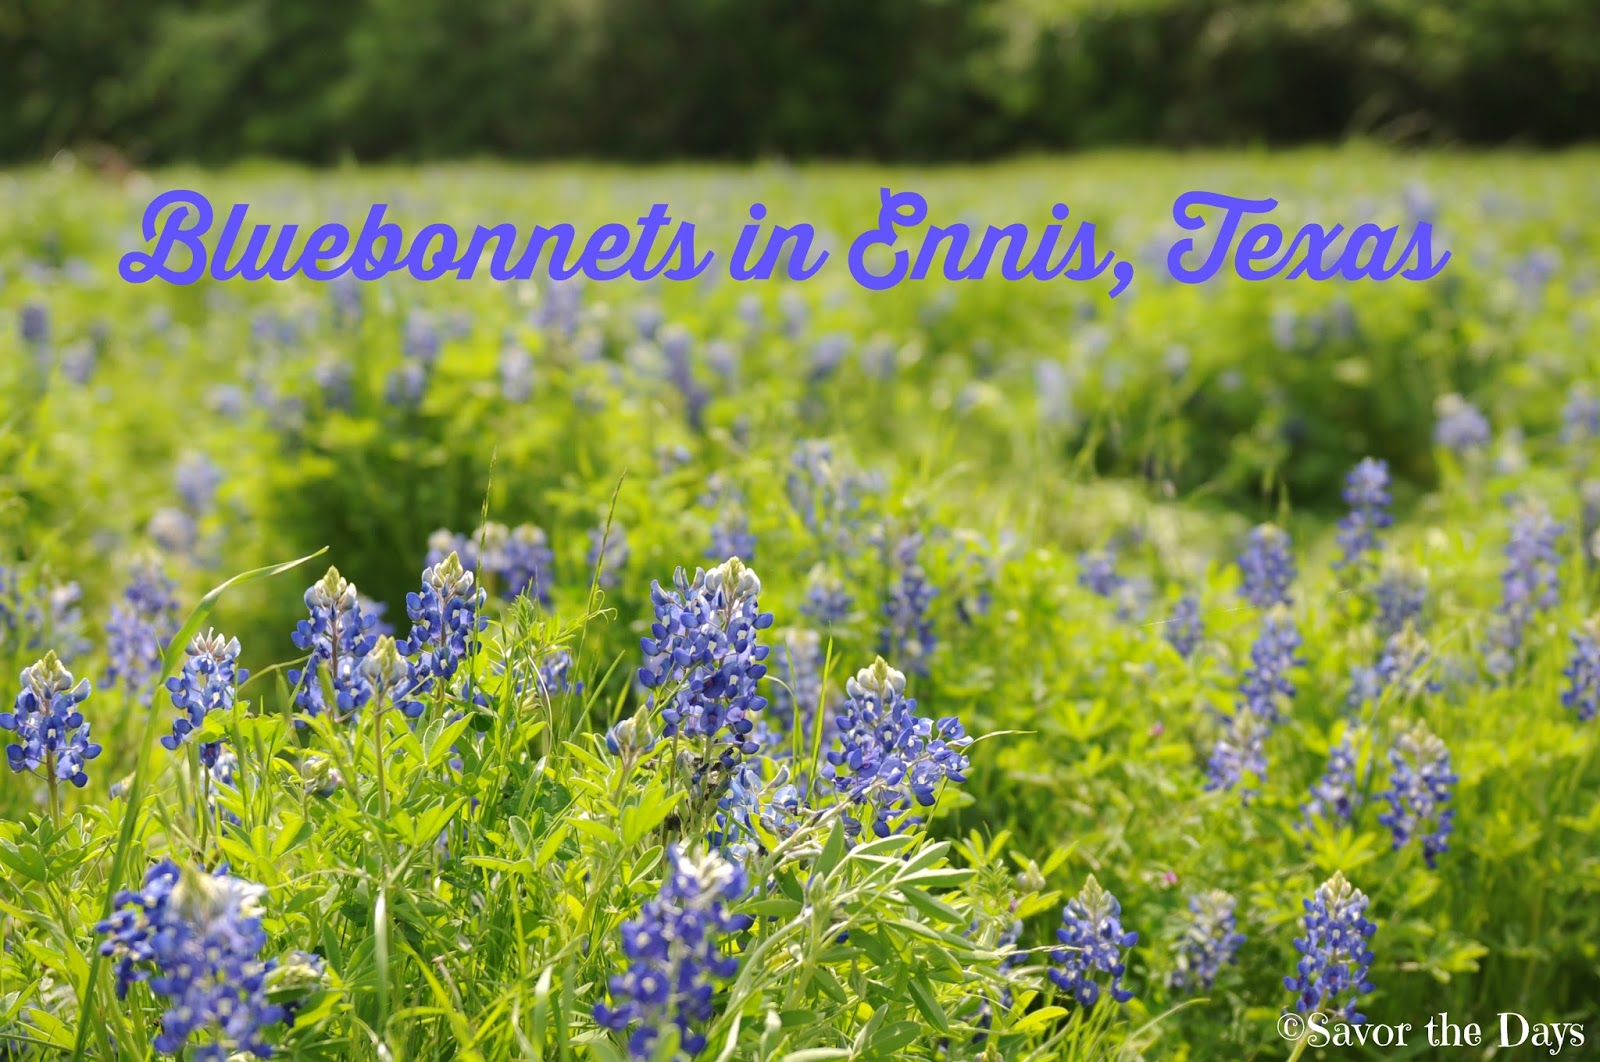 savor the days bluebonnets in ennis texas